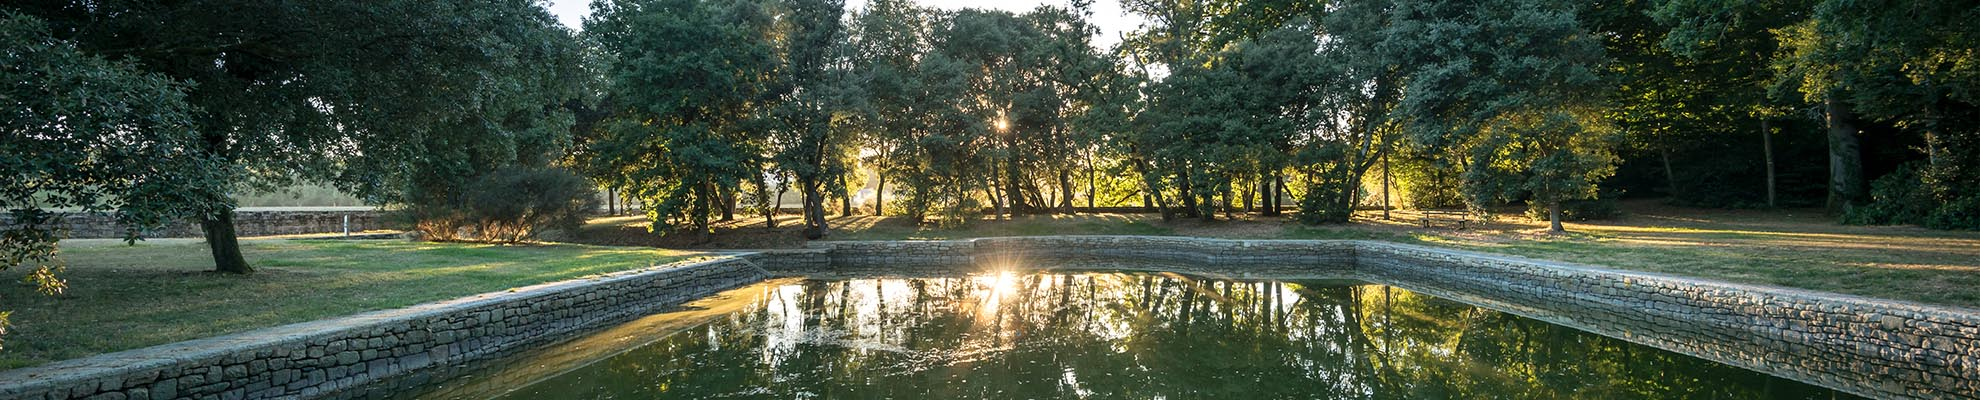 camping-lanniron-parc-jardin